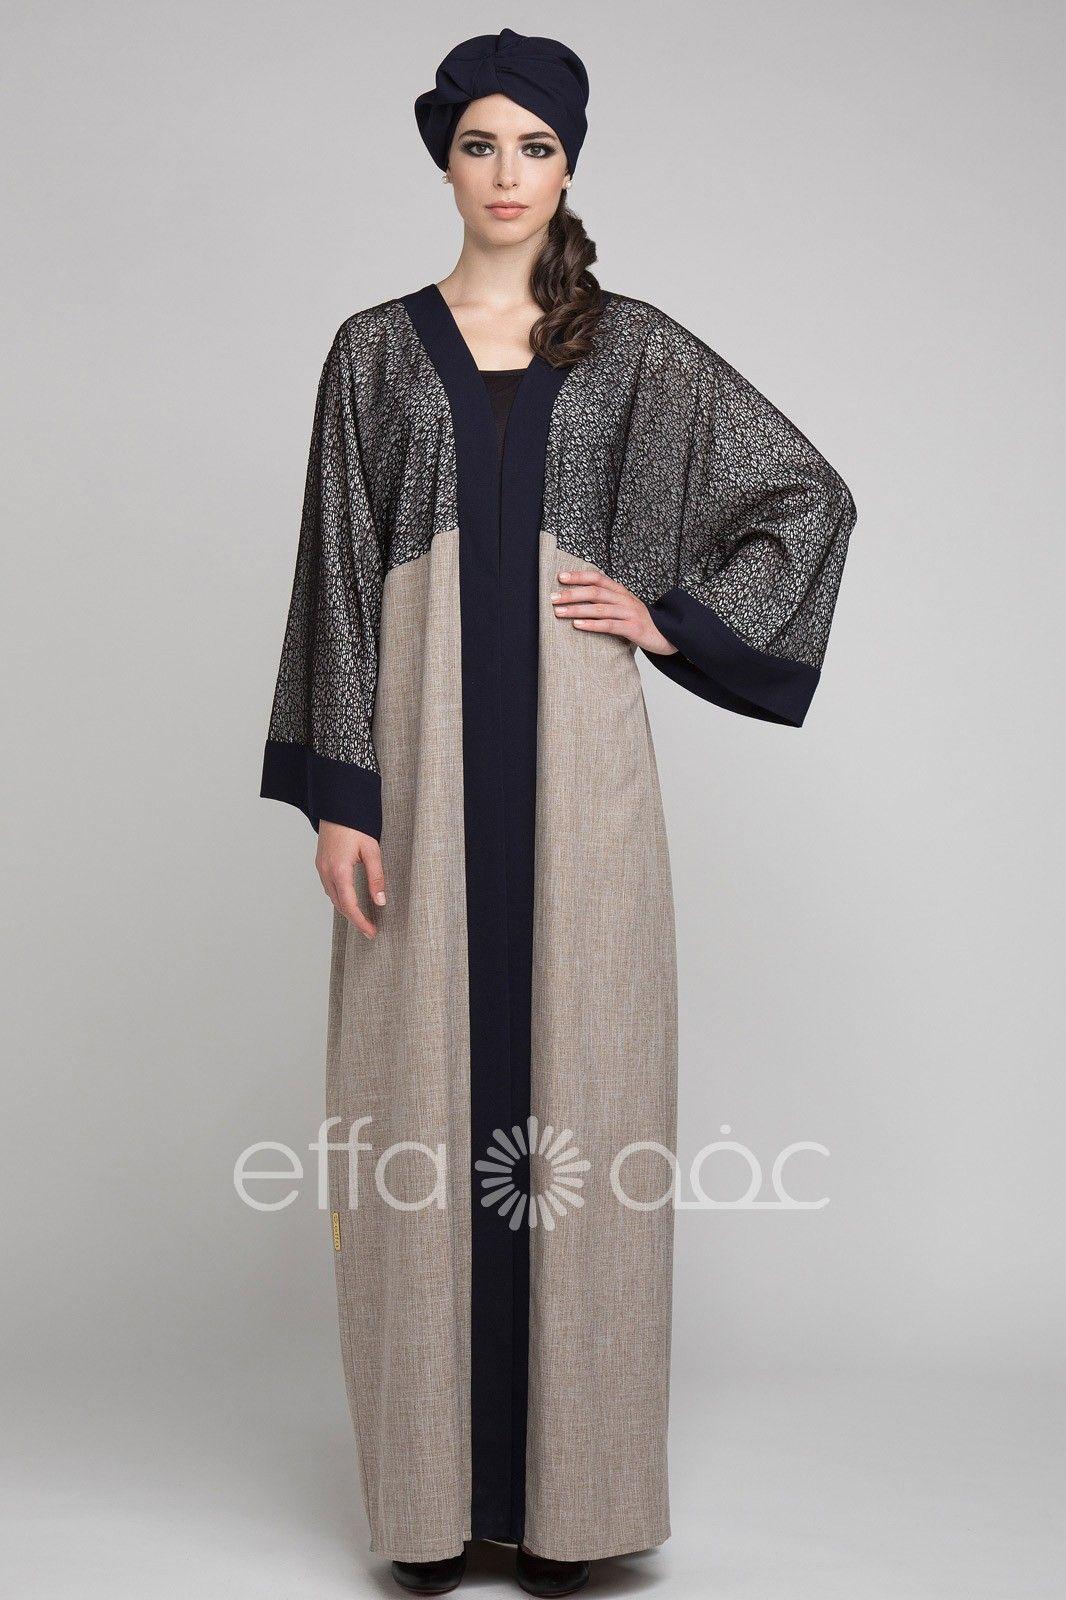 74d09b40bf8 linen abaya | Linen Abaya Related Keywords & Suggestions - Linen Abaya Long  Tail .